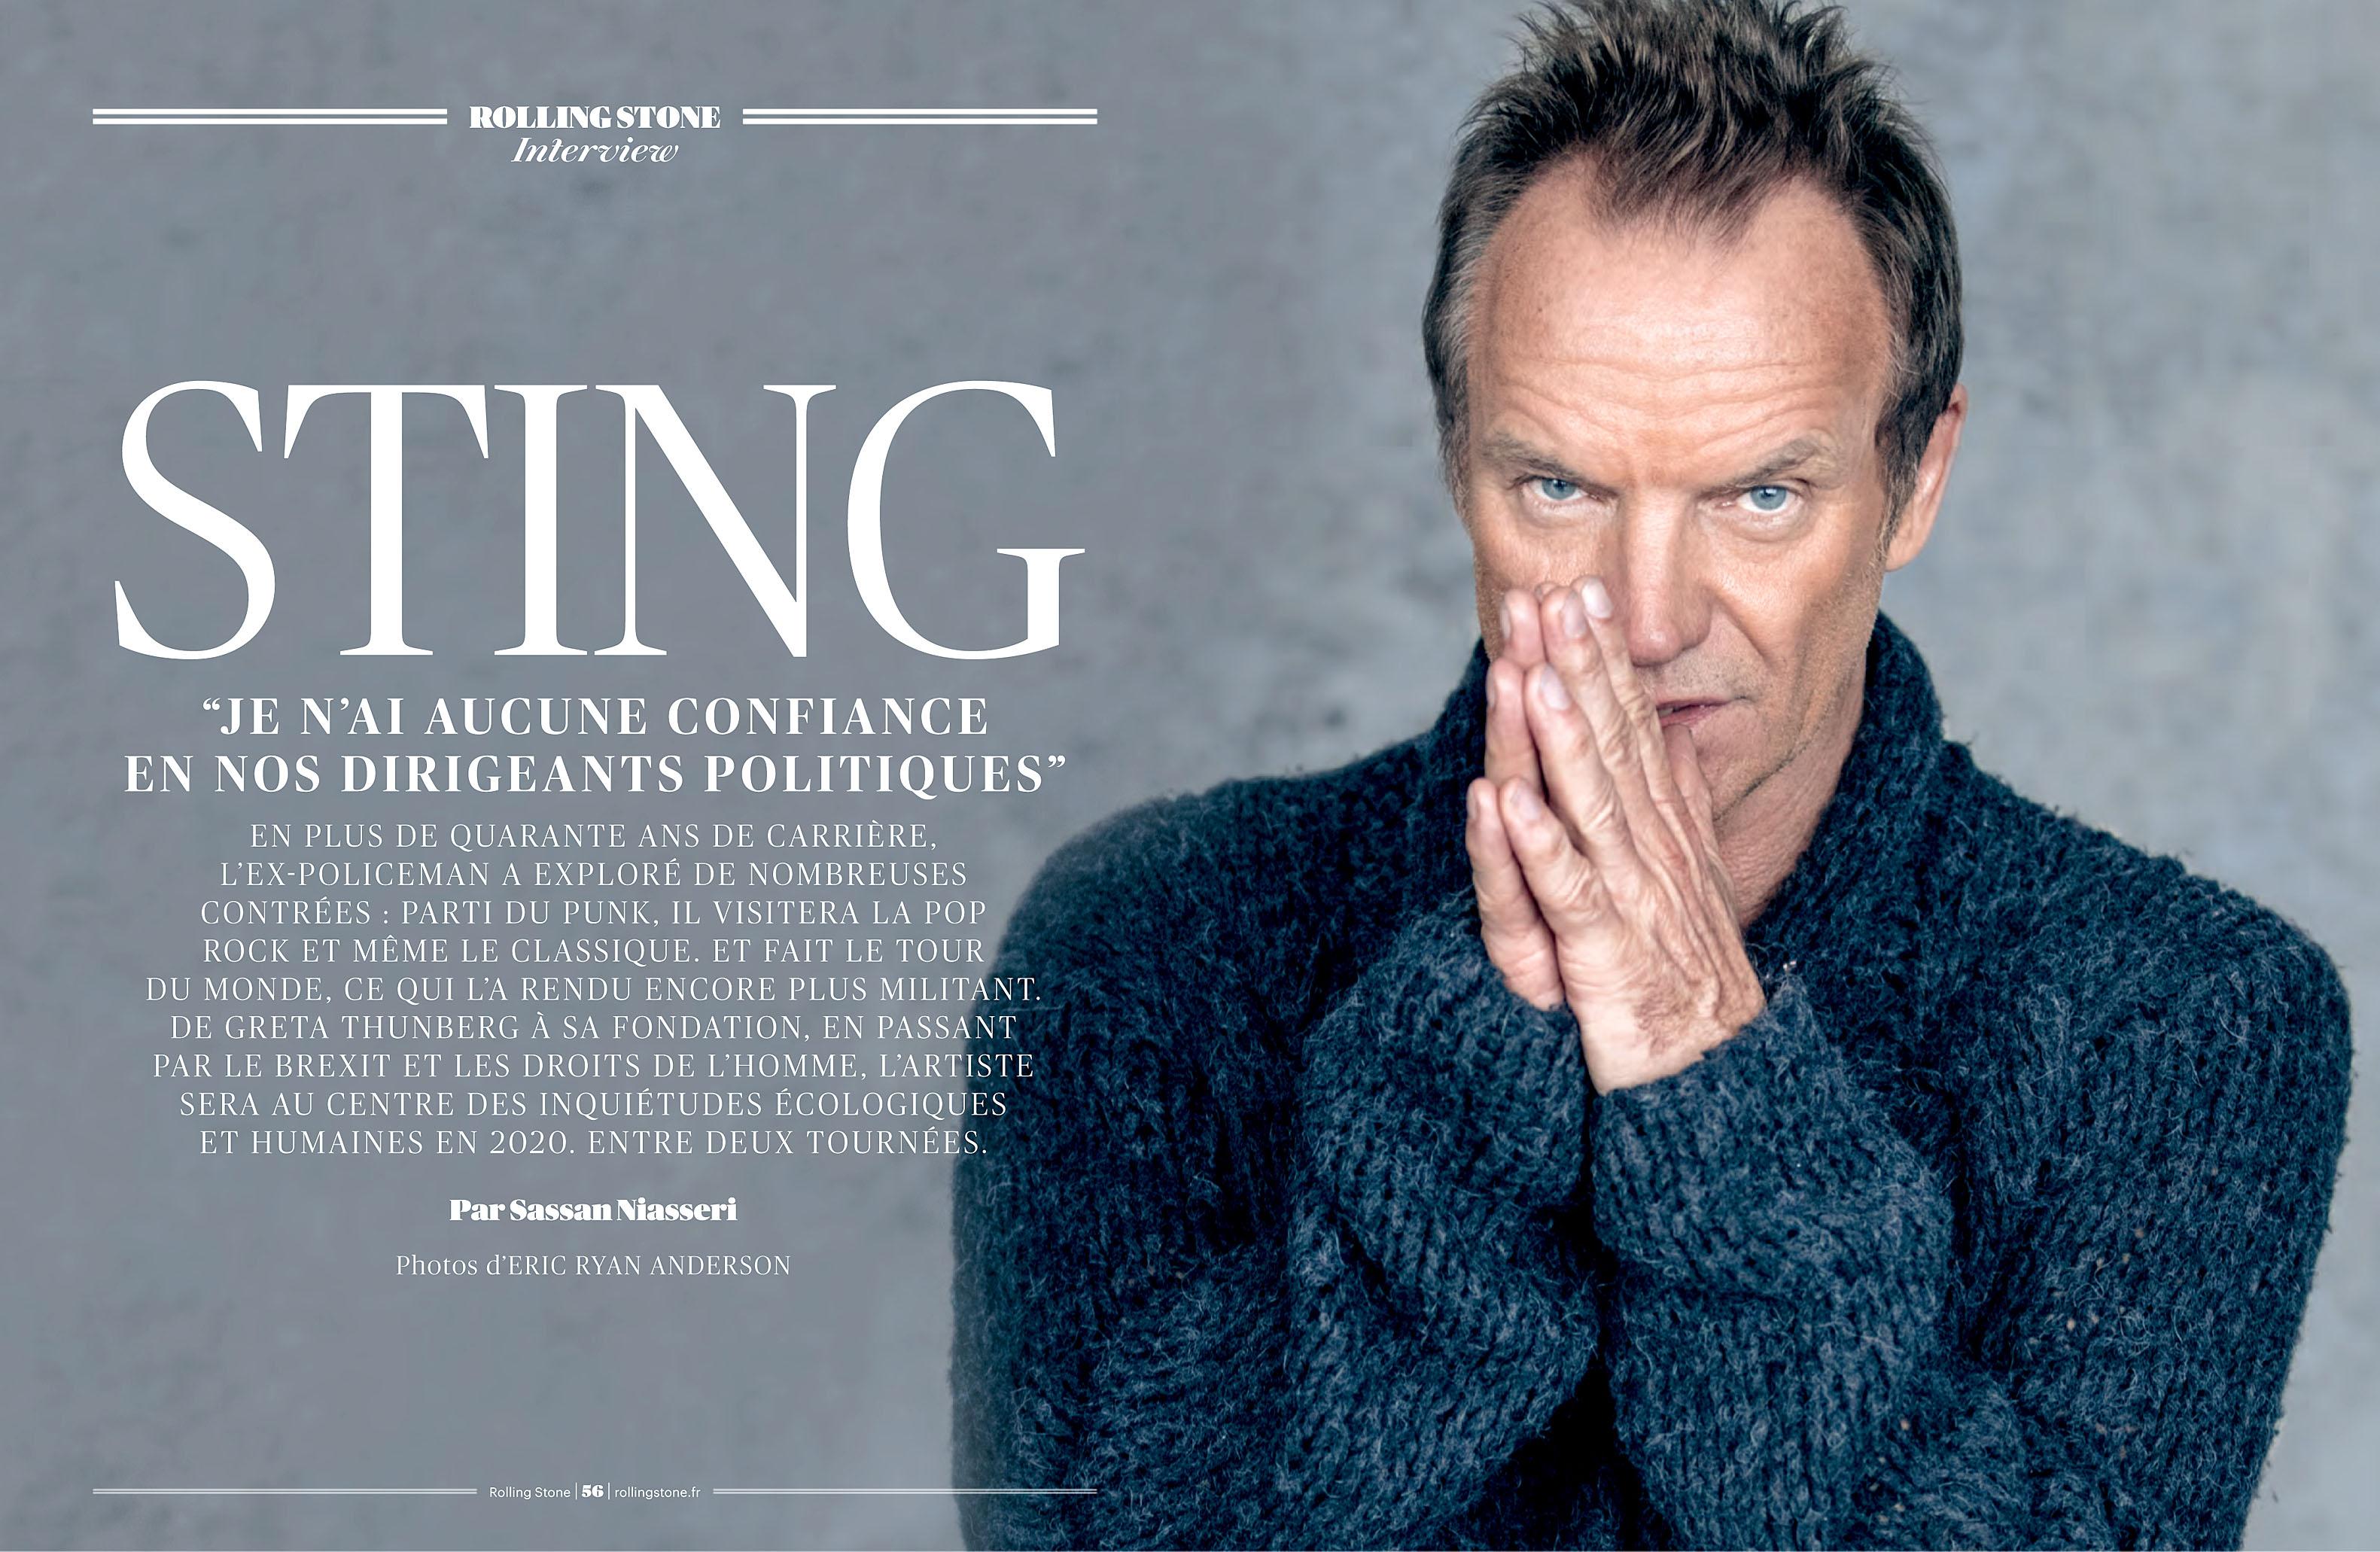 Rolling Stone Fr 2020-01-02 Sting 02.jpg